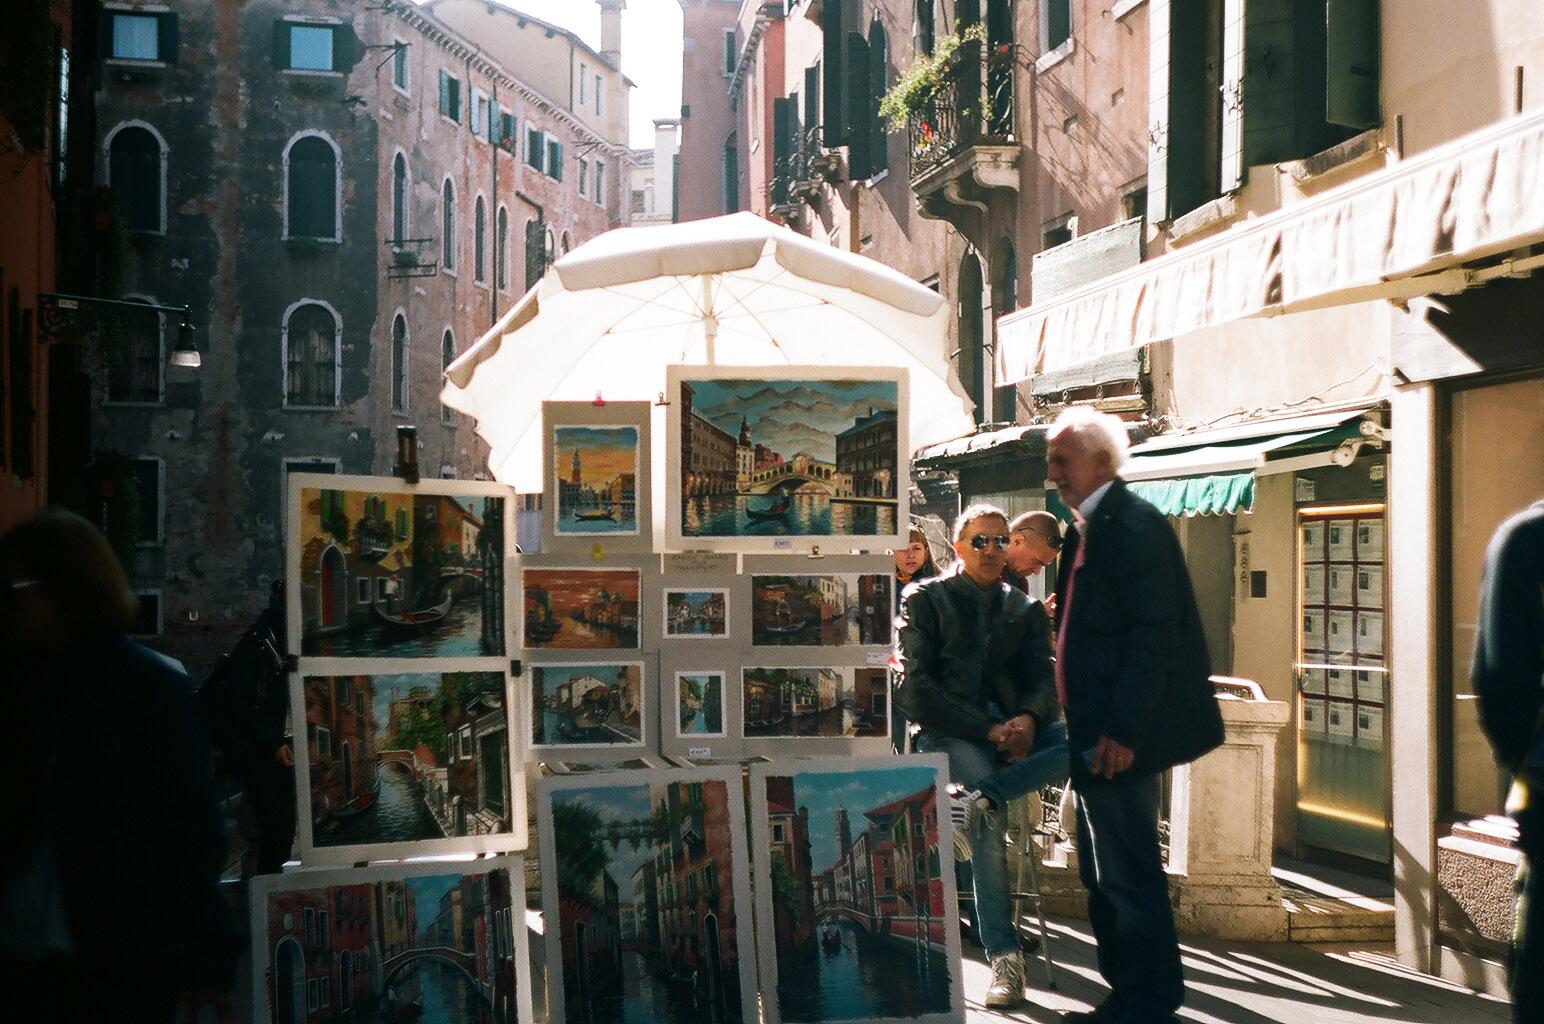 Культурные столицы Италии Культурные столицы Италии 15596431119 da3e34a1ab o